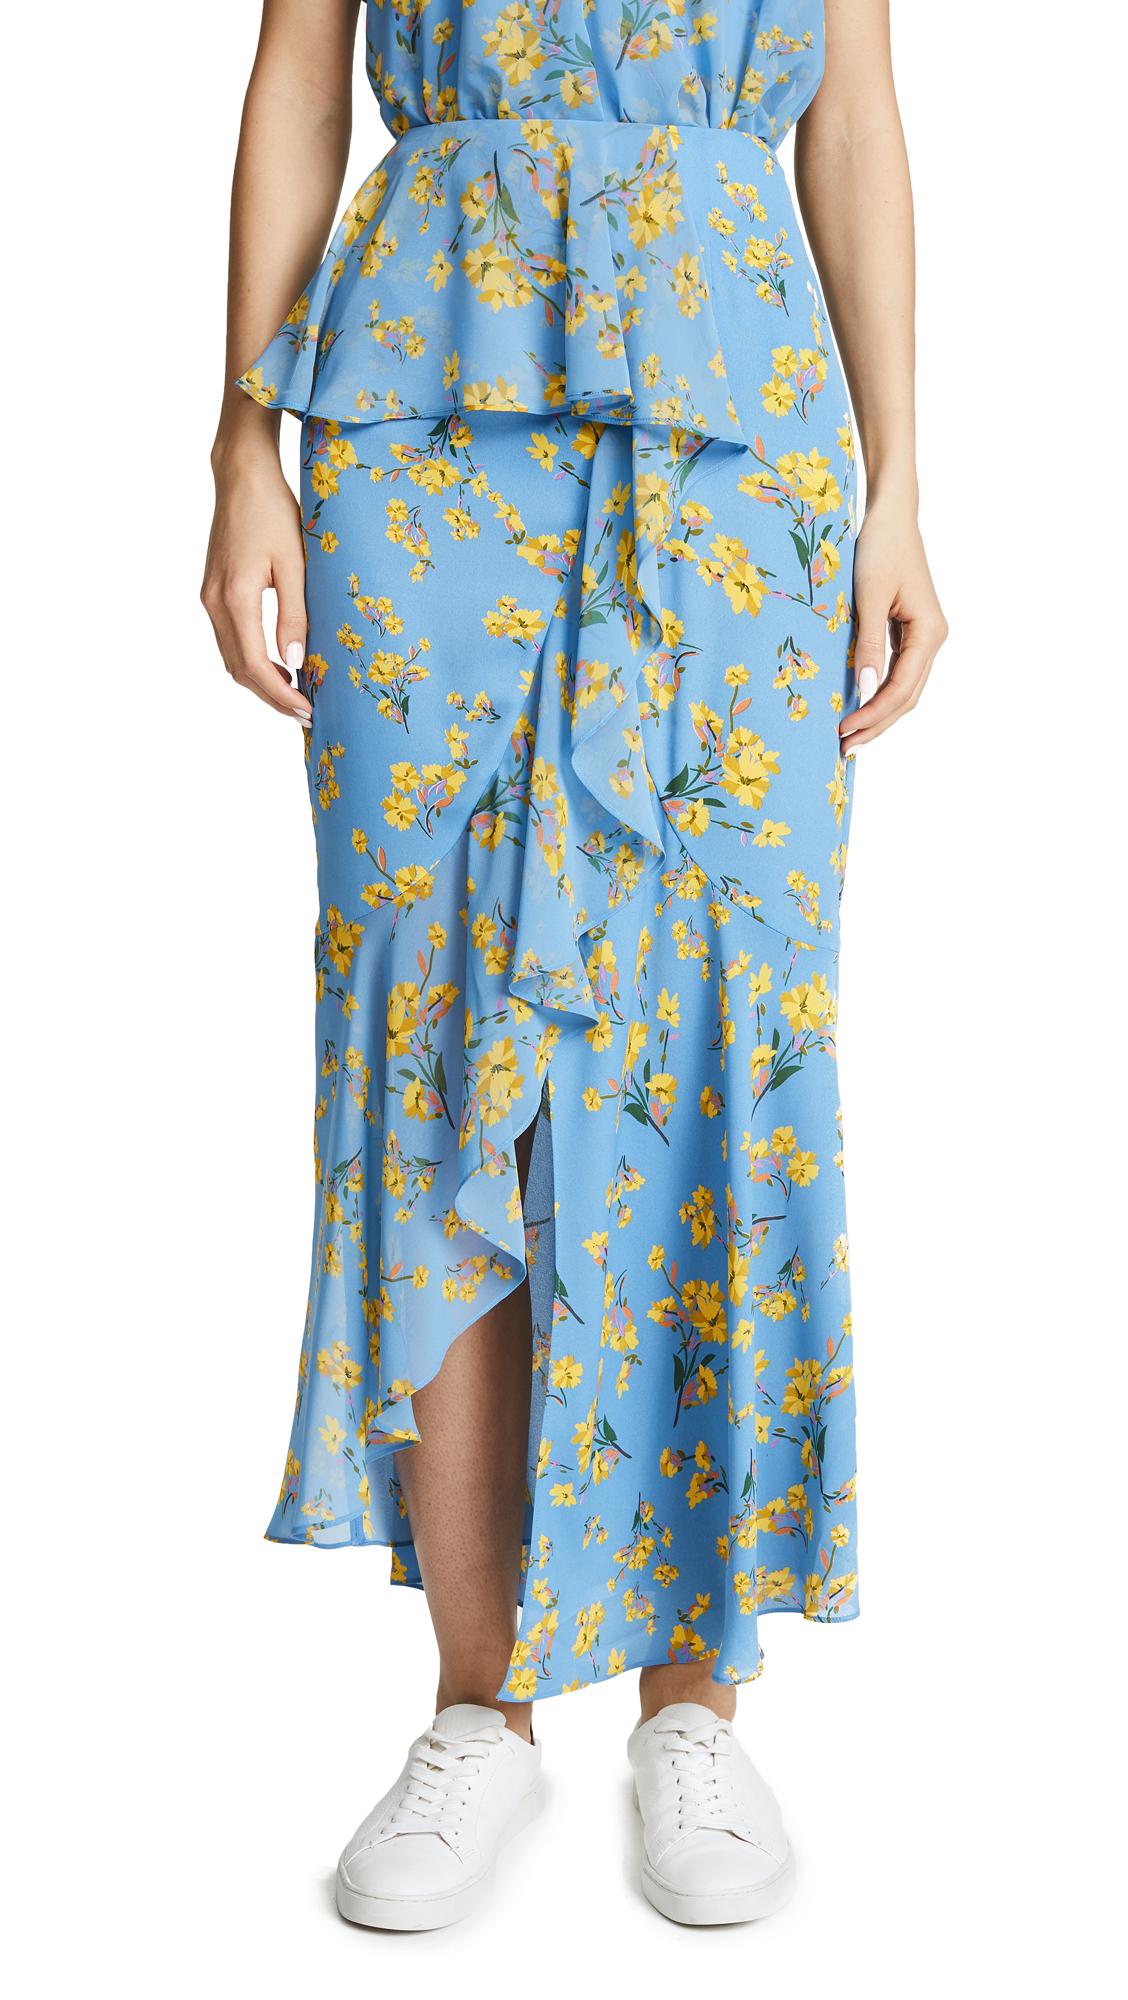 GOEN.J Asymmetrical Skirt with Ruffles - Sky Blue